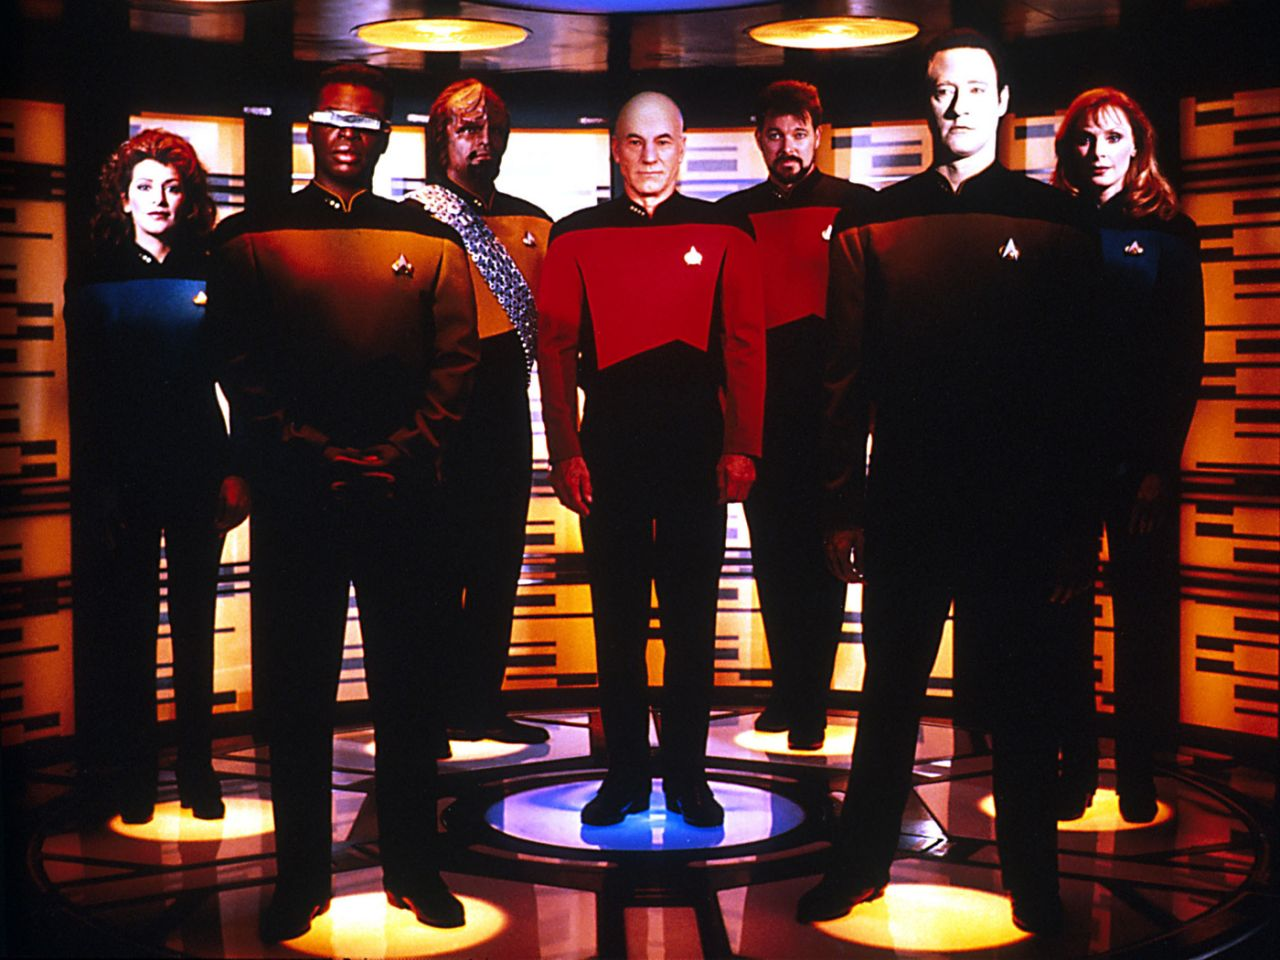 Star Trek The Next Generation Crew Wallpaper 1280x960